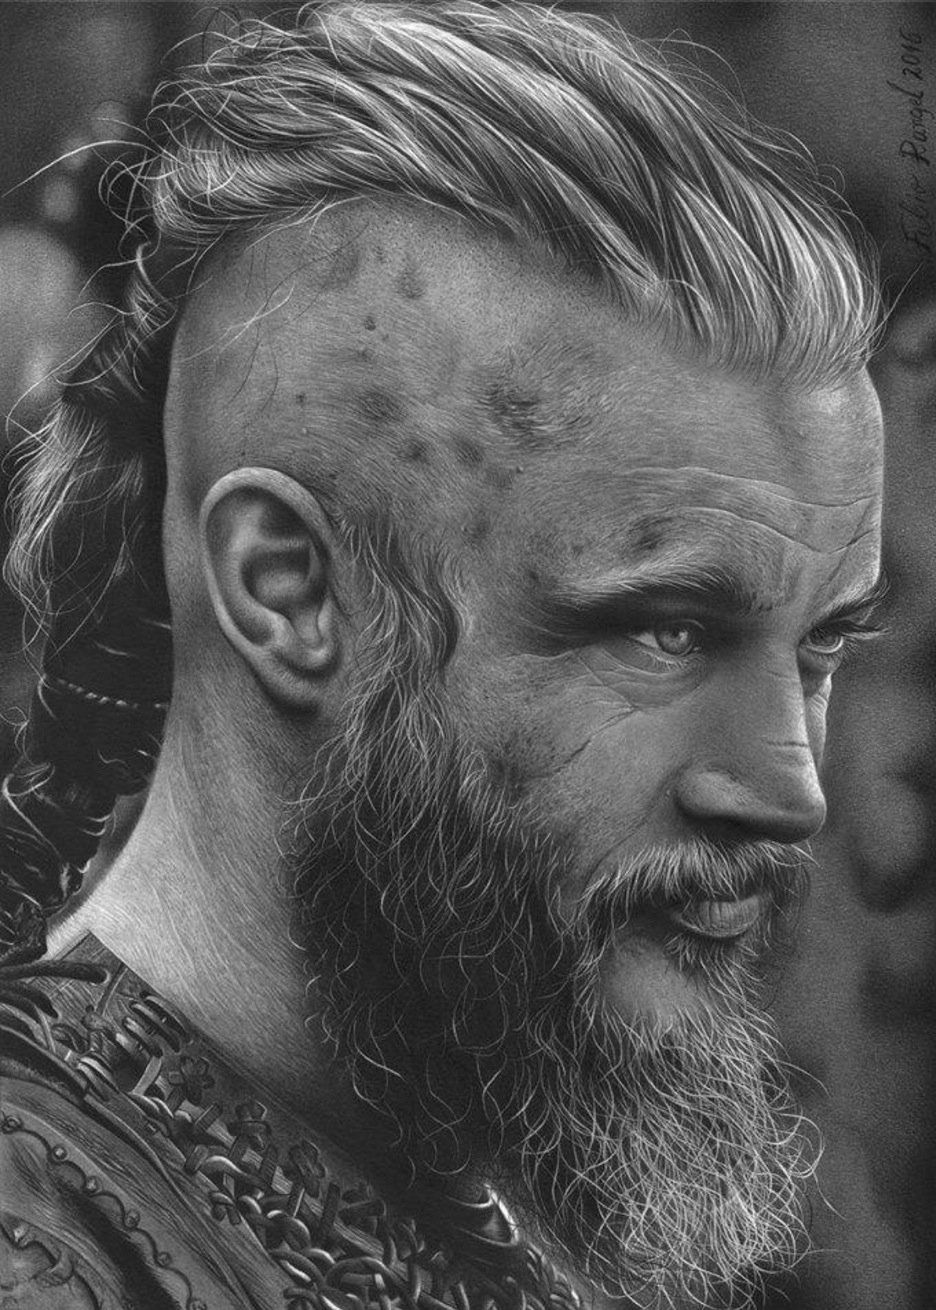 солистка рисунки викингов фото фантазию